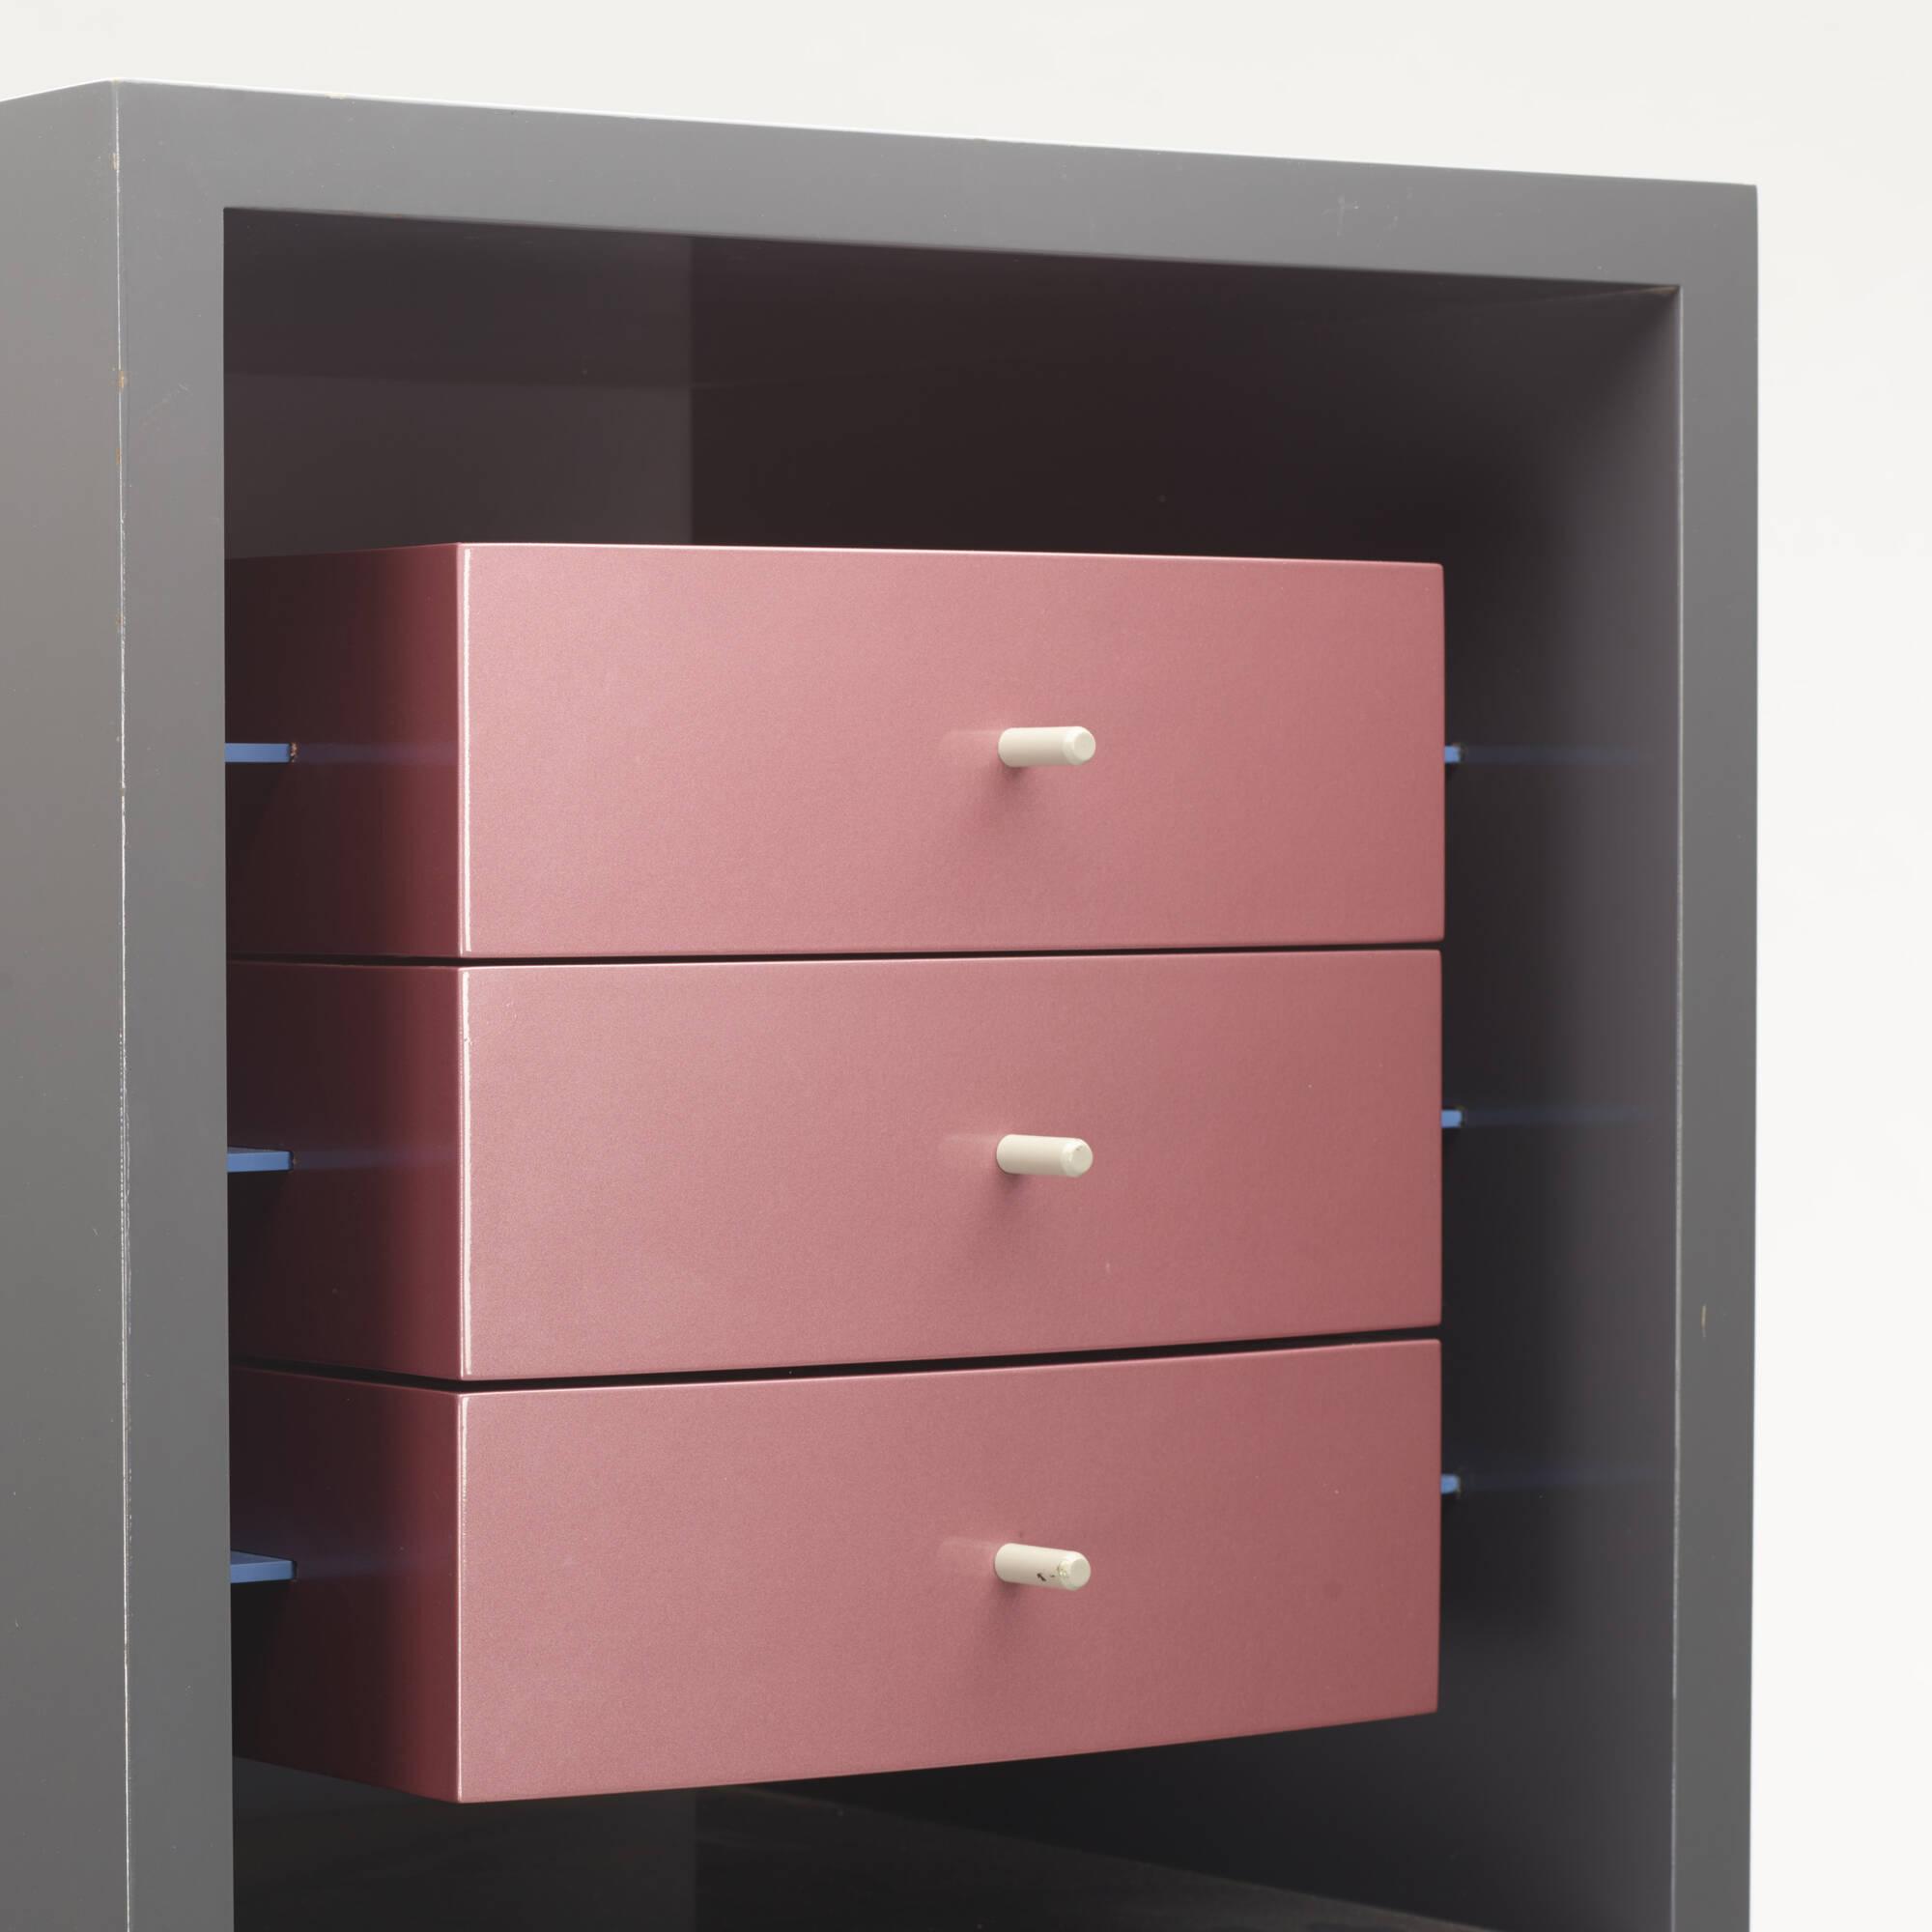 111: Shiro Kuramata / NIKKO cabinet < Art + Design, 12 October ...